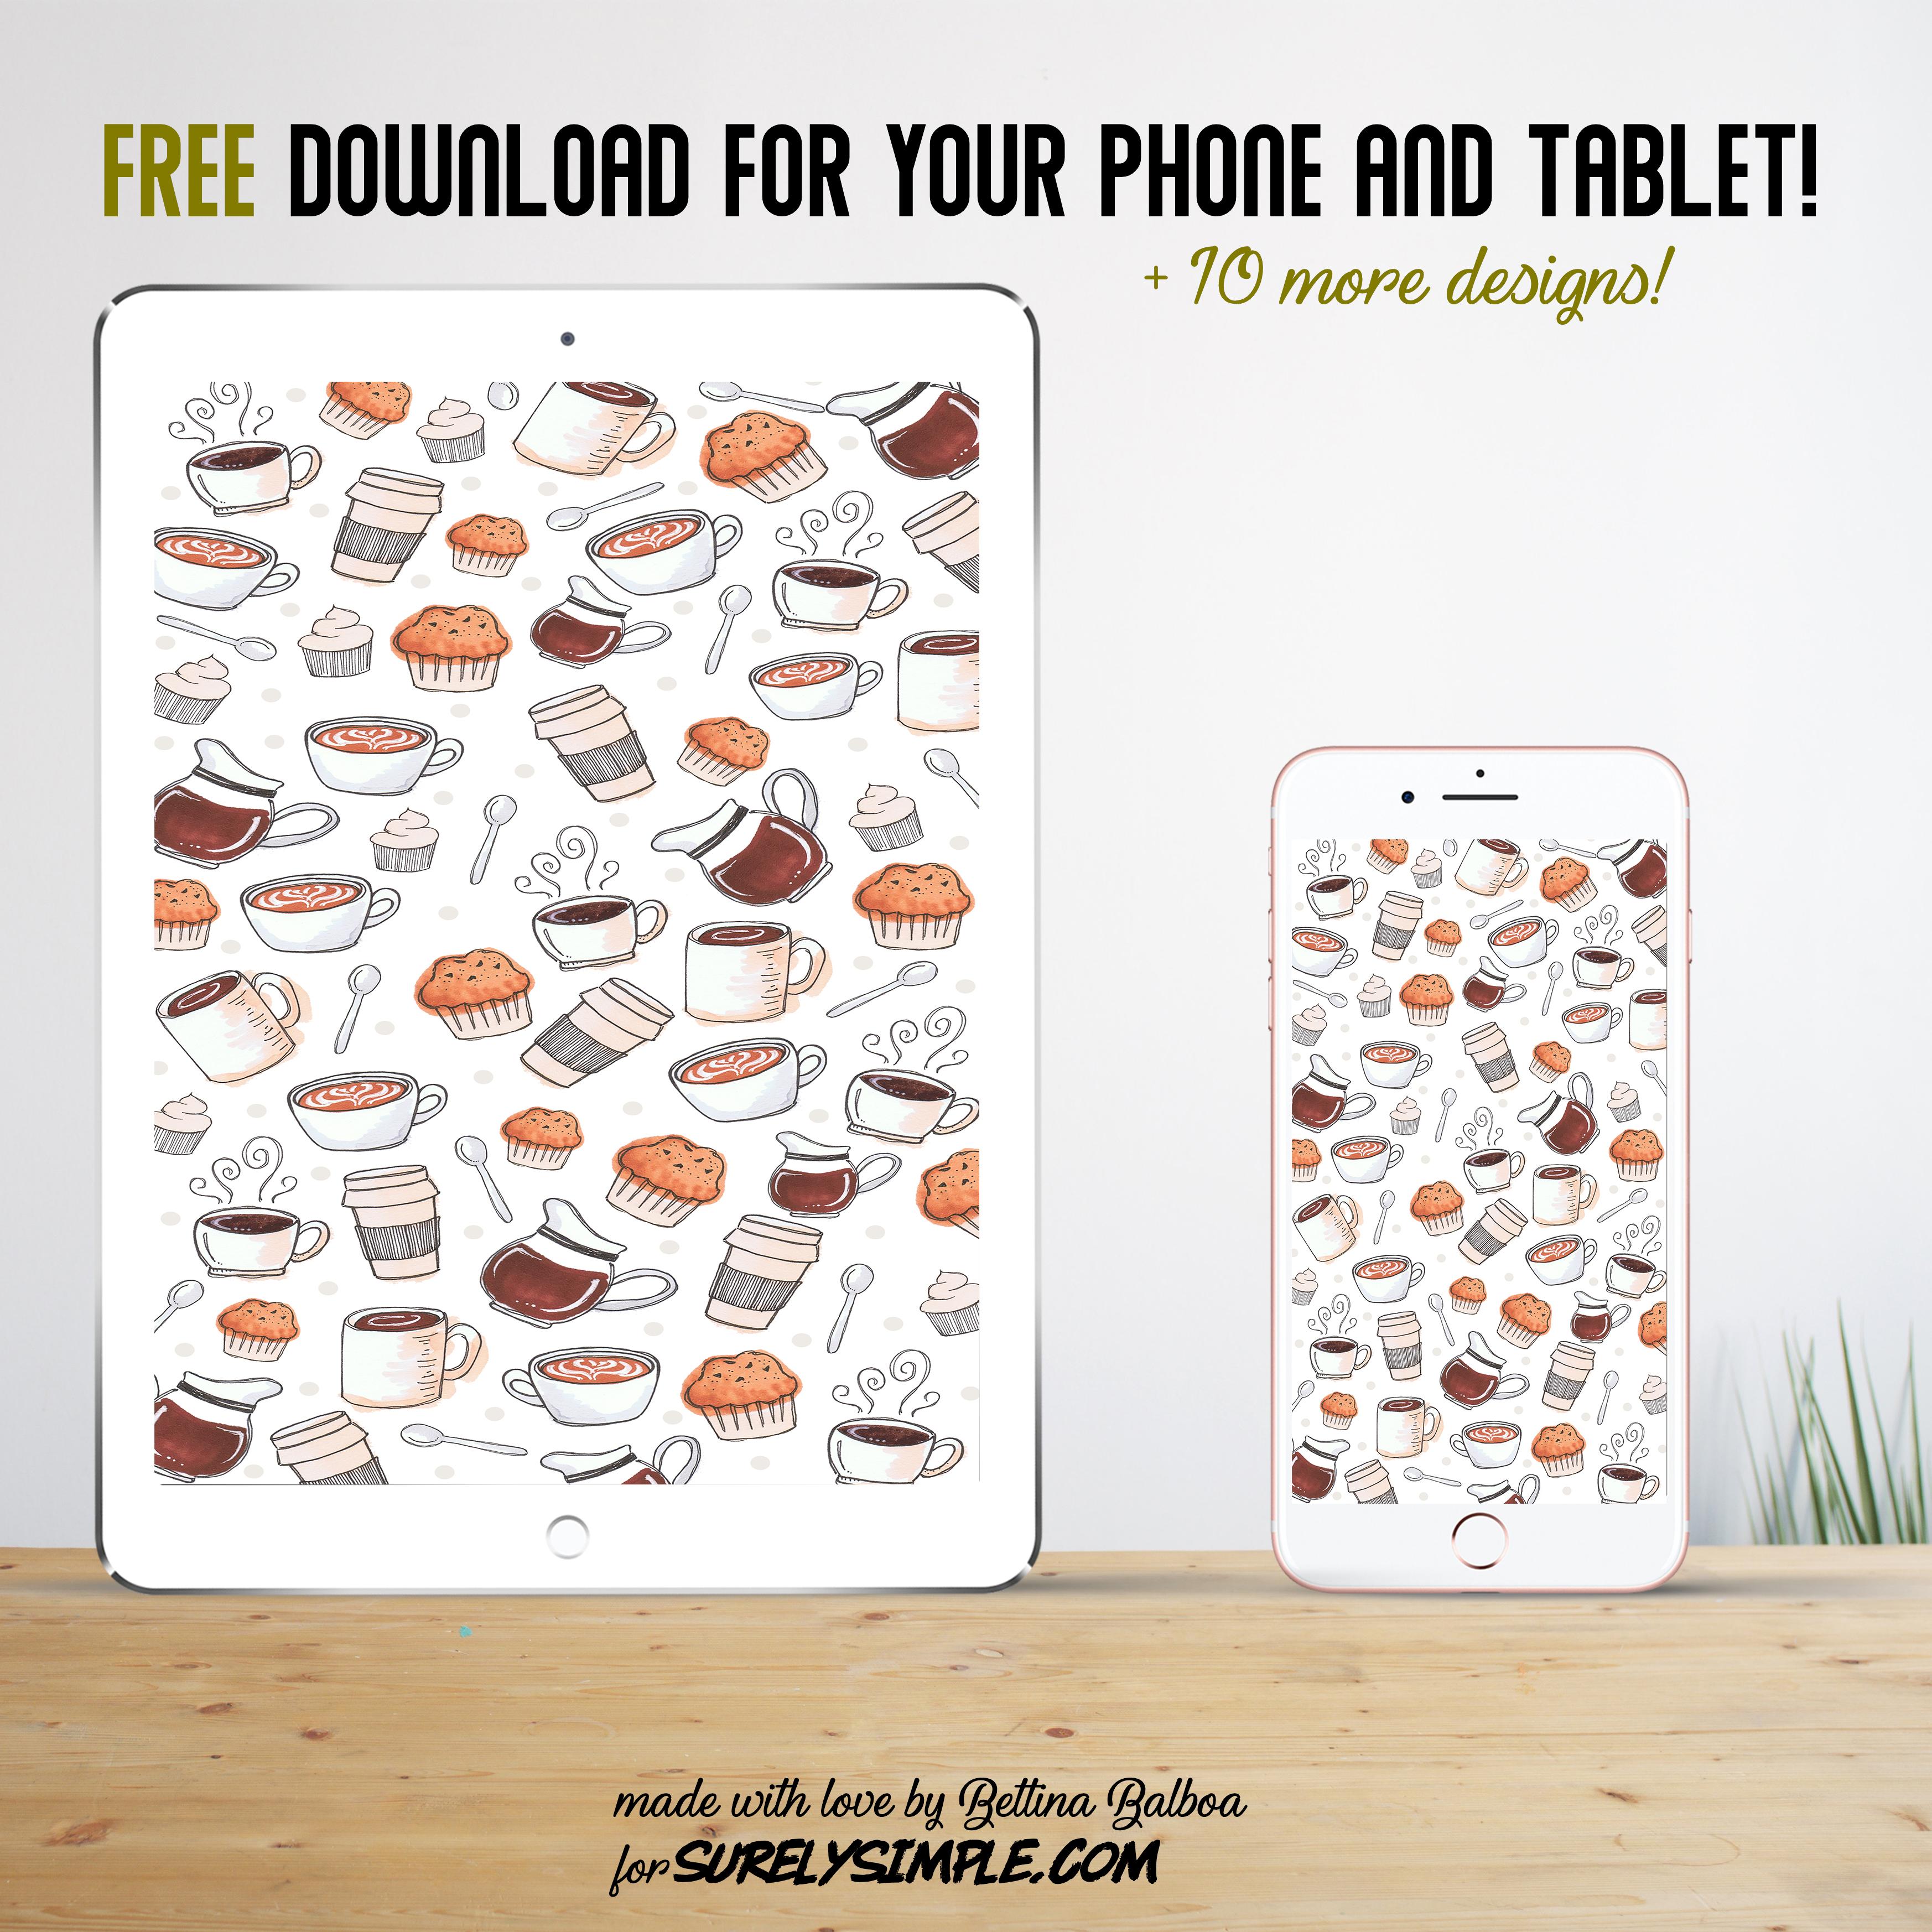 11 Free Phone and Desktop Wallpapers! | 3 | Pattern Chic via Surelysimple.com